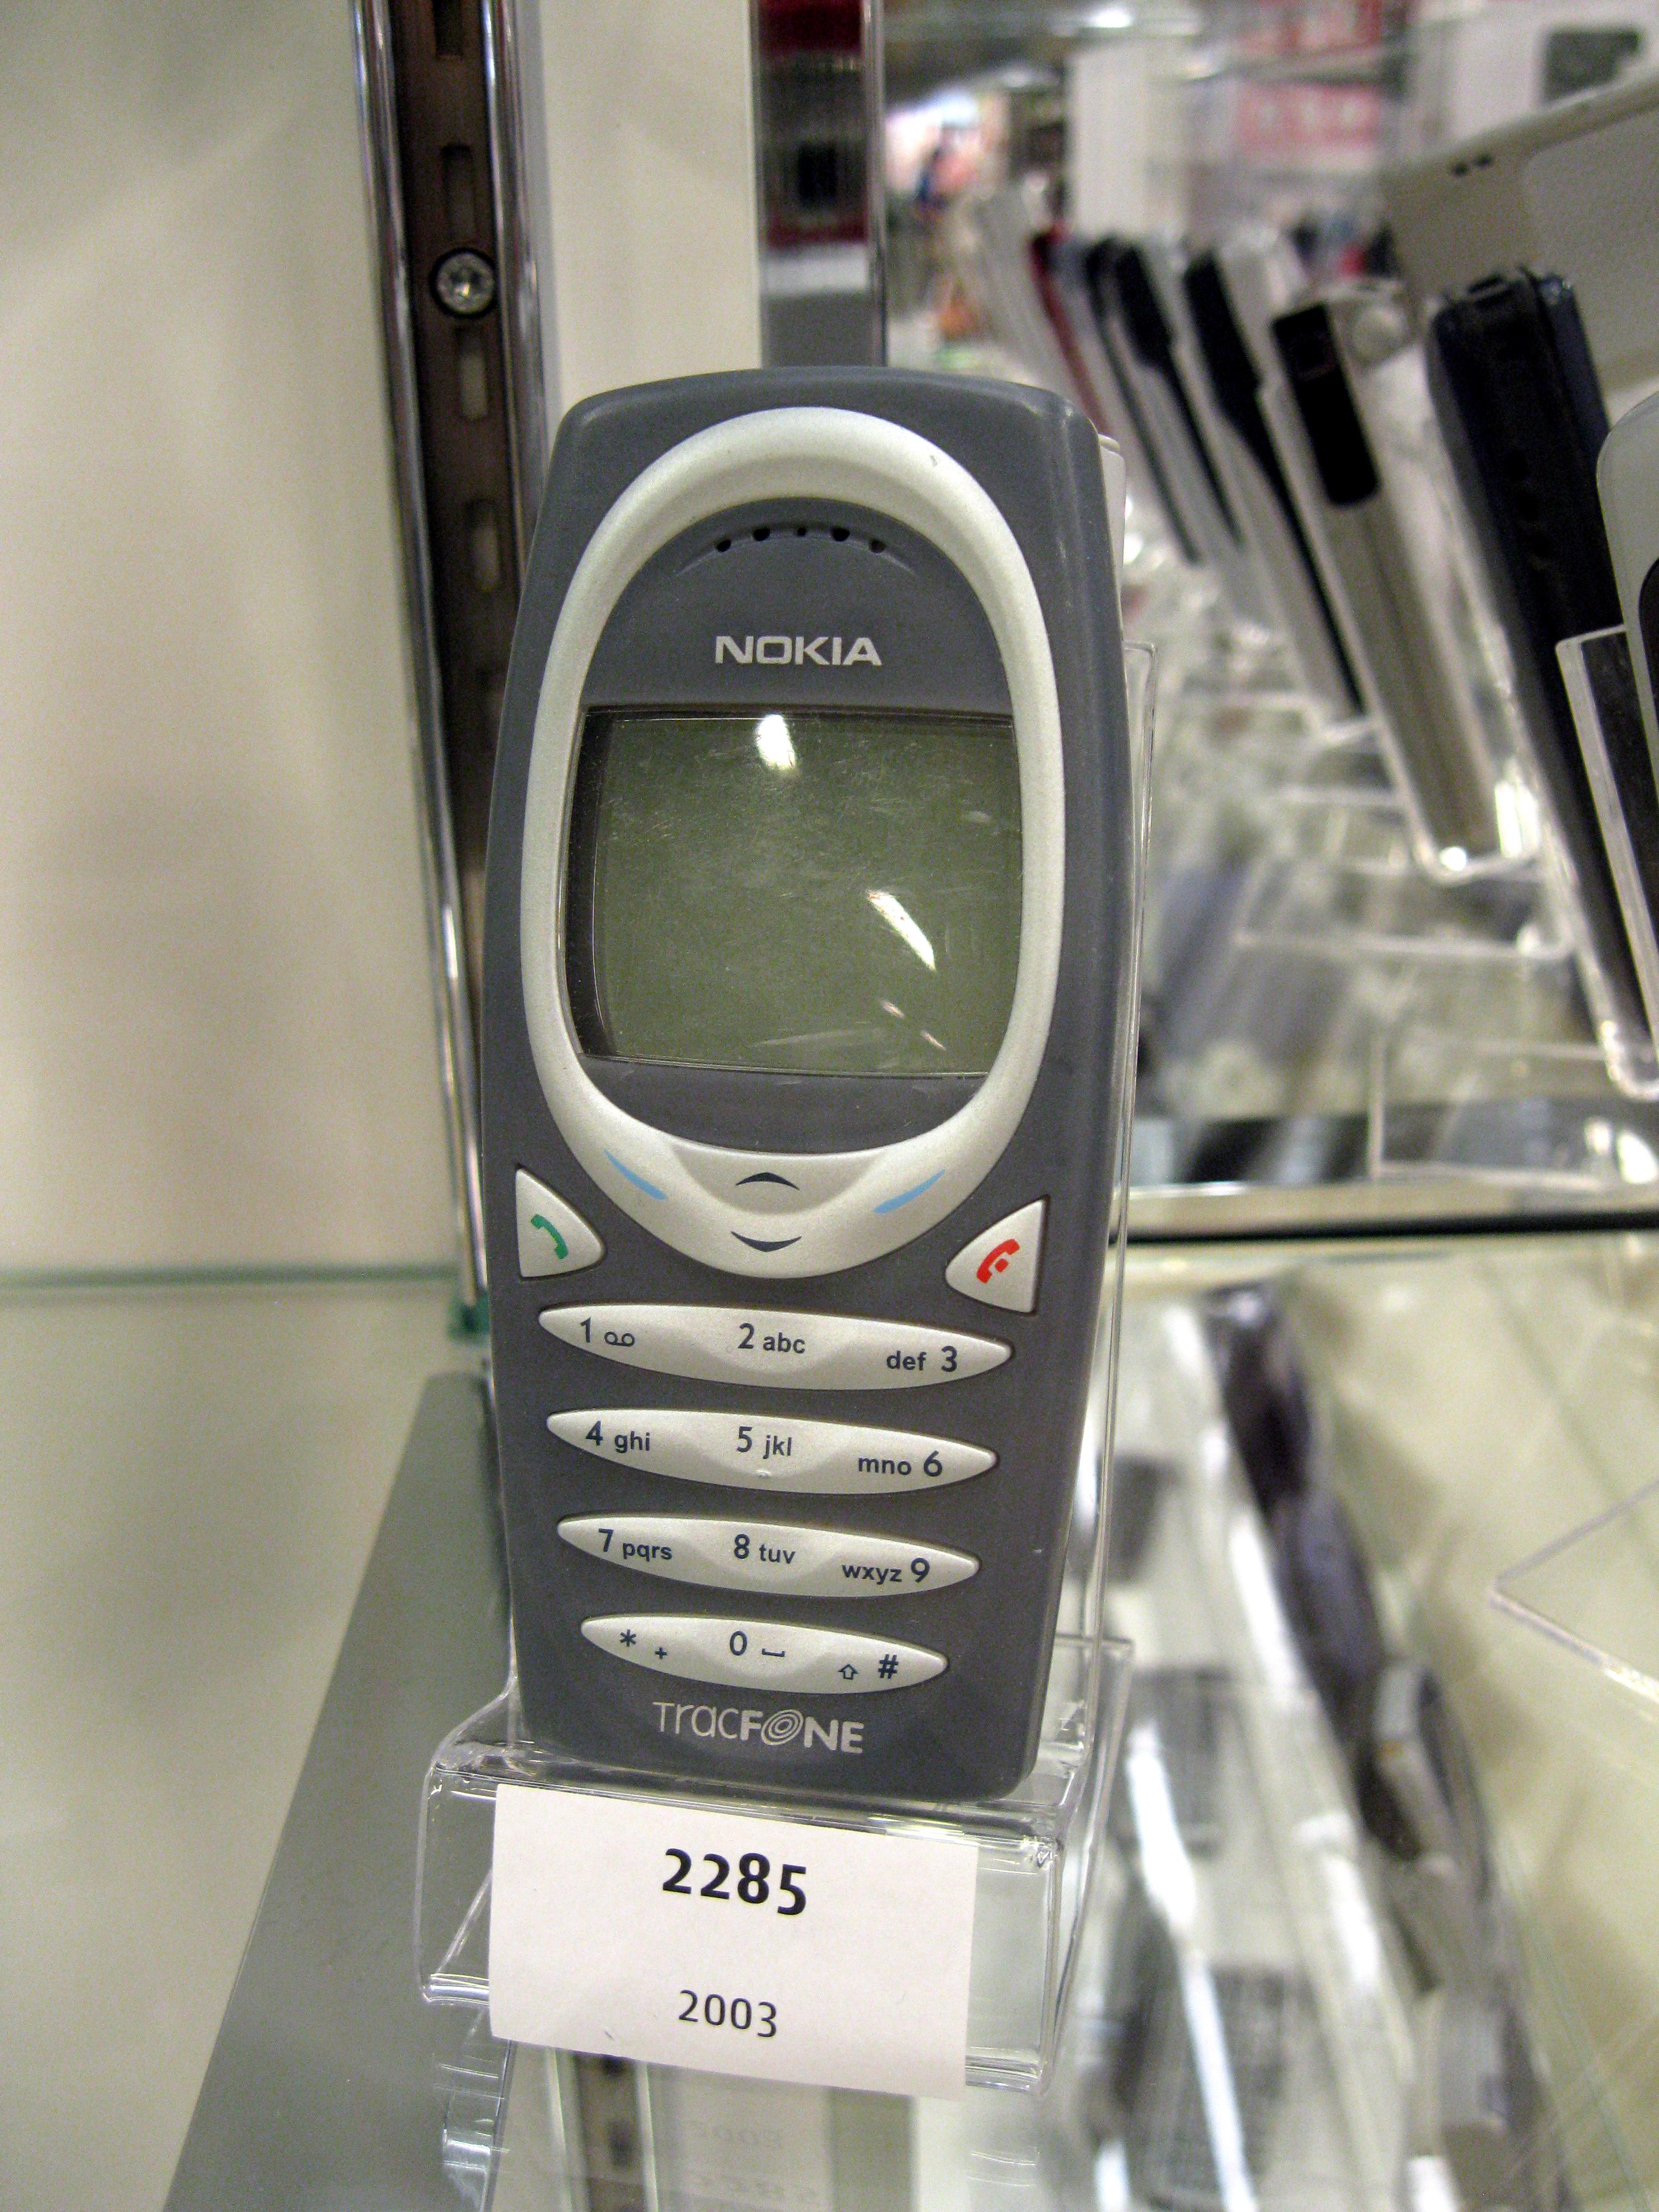 File:Nokia 2285.jpg